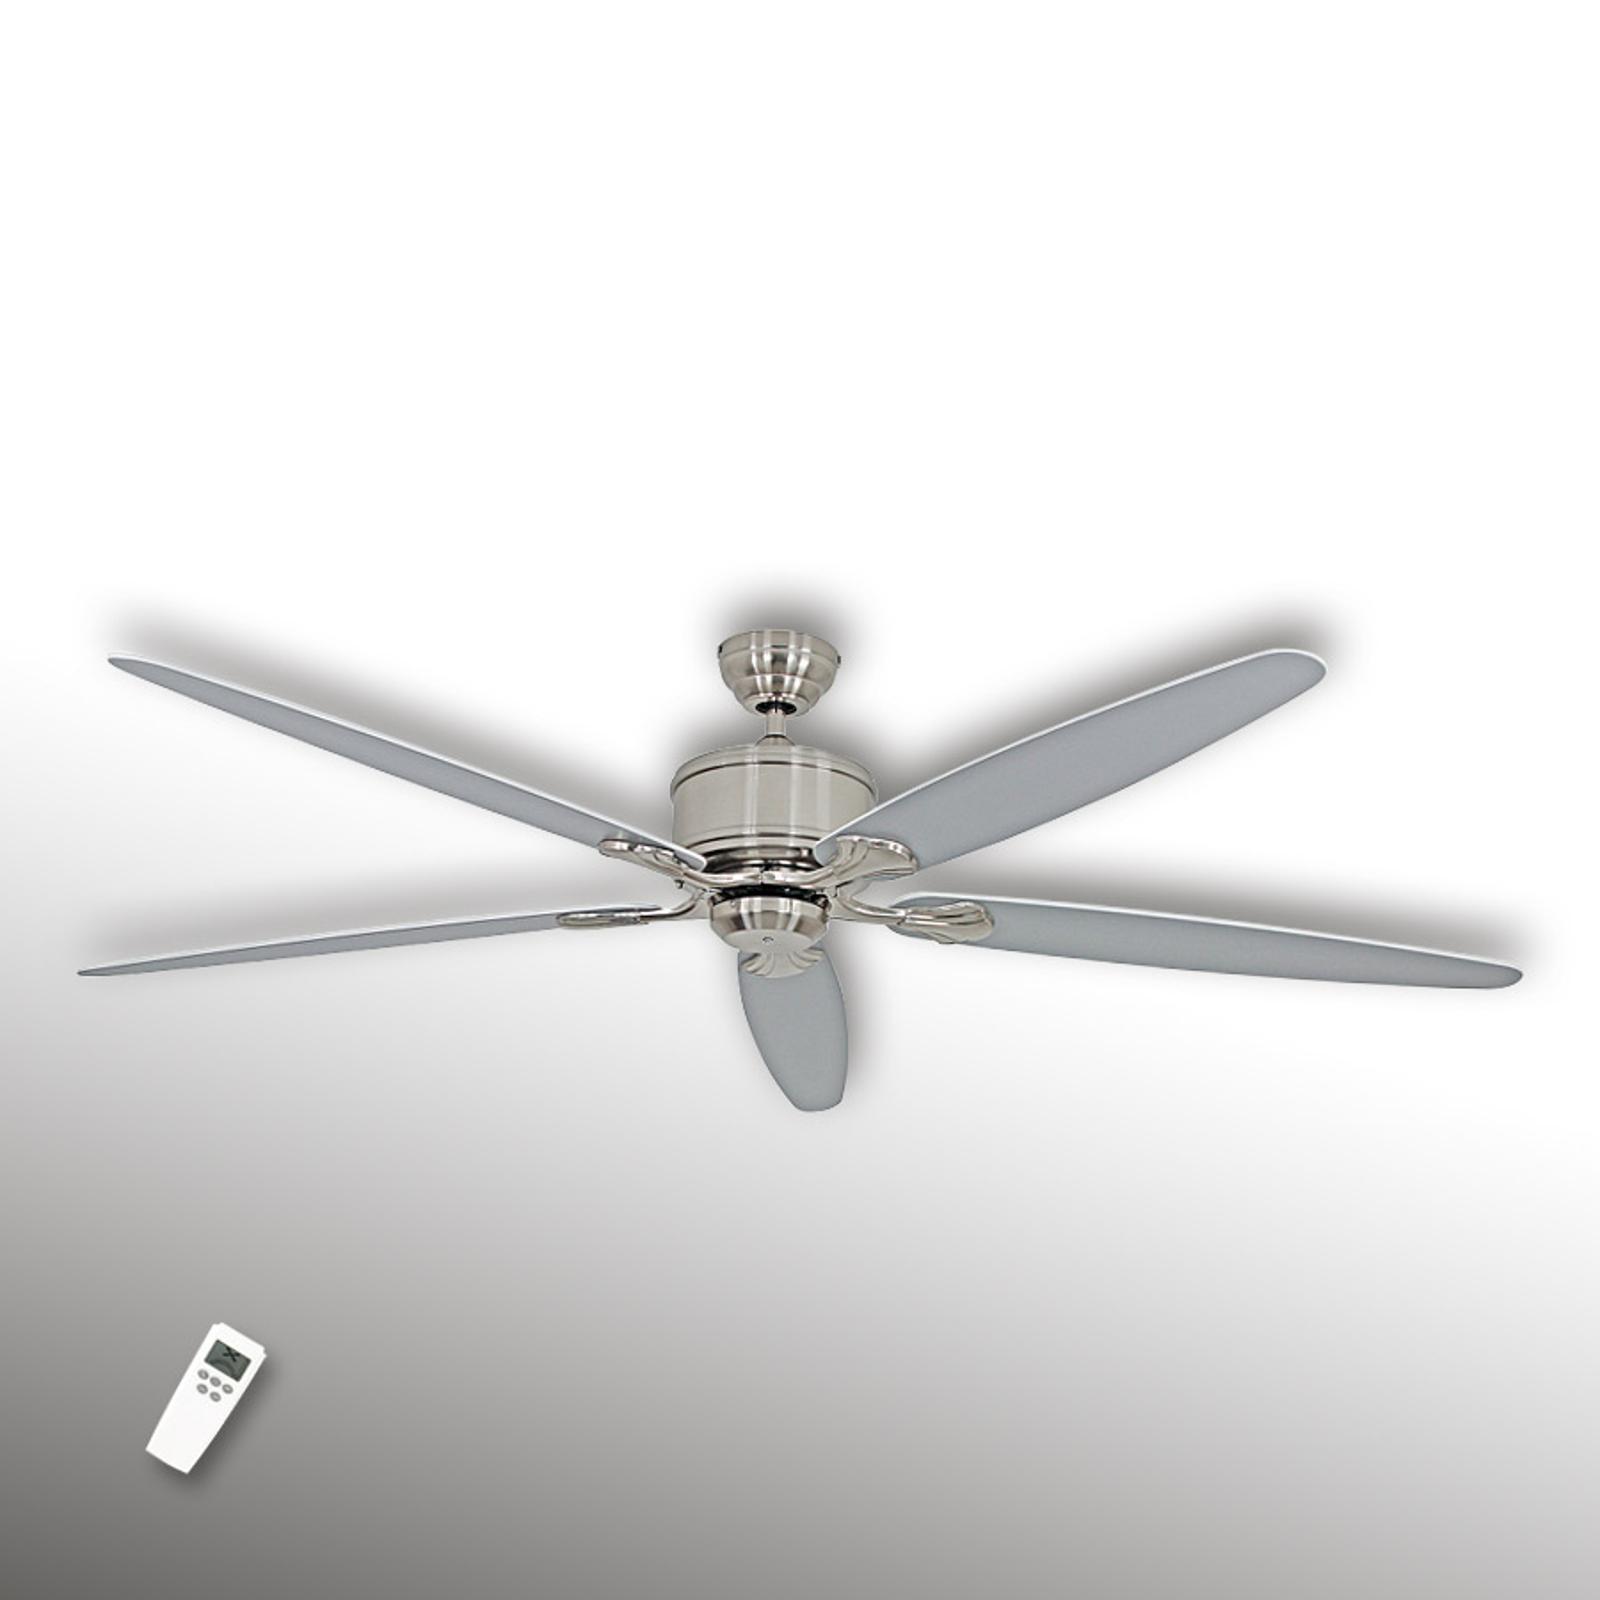 Zuinige plafondventilator Eco Elements, chroom